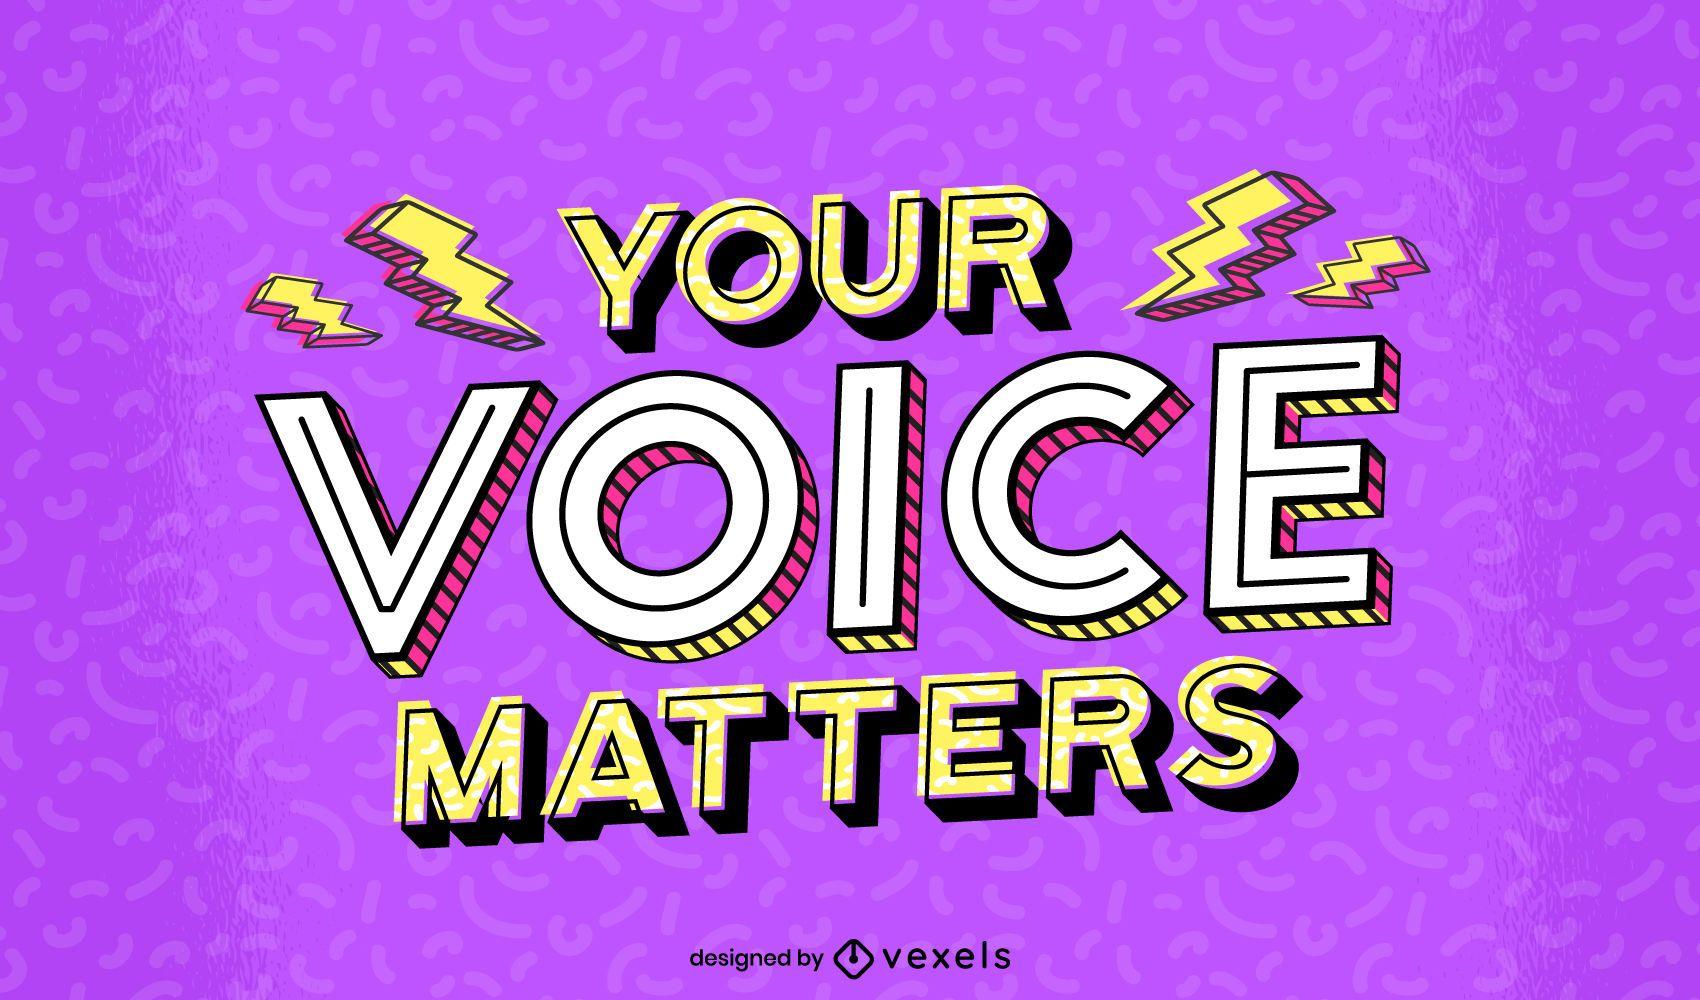 Your voice matters lettering design